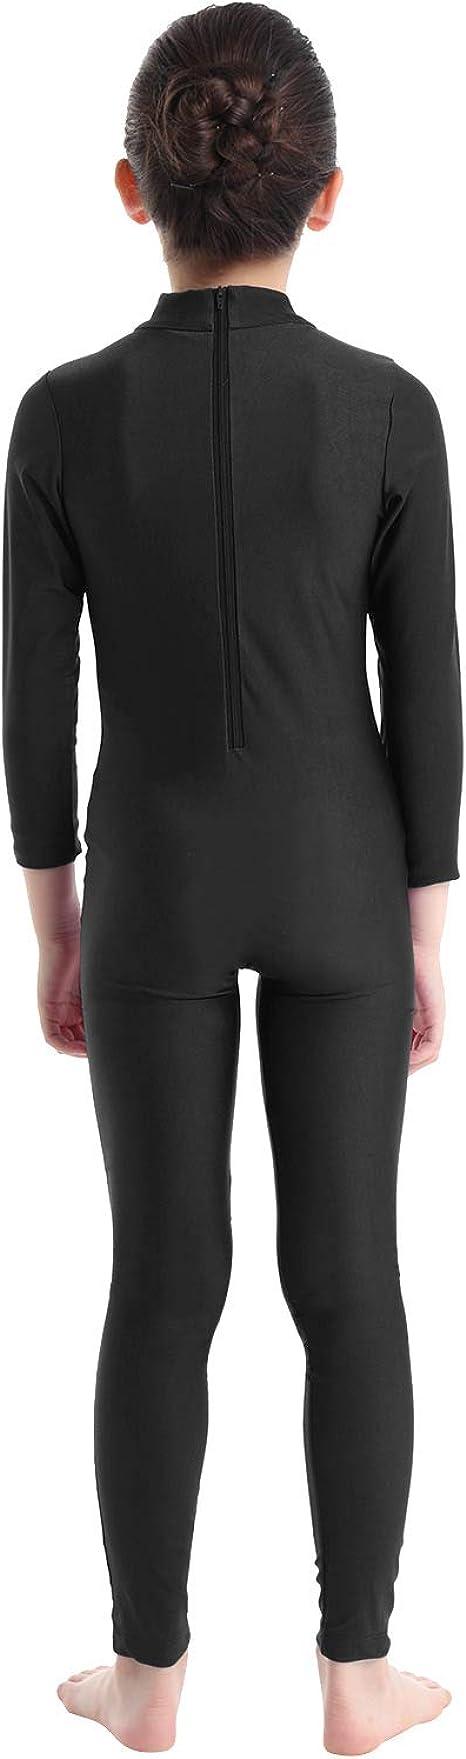 iiniim Girls Long Sleeve Ballet Dance Gymnastics Kids Catsuit Bodysuits Unitard Dancewear Costume